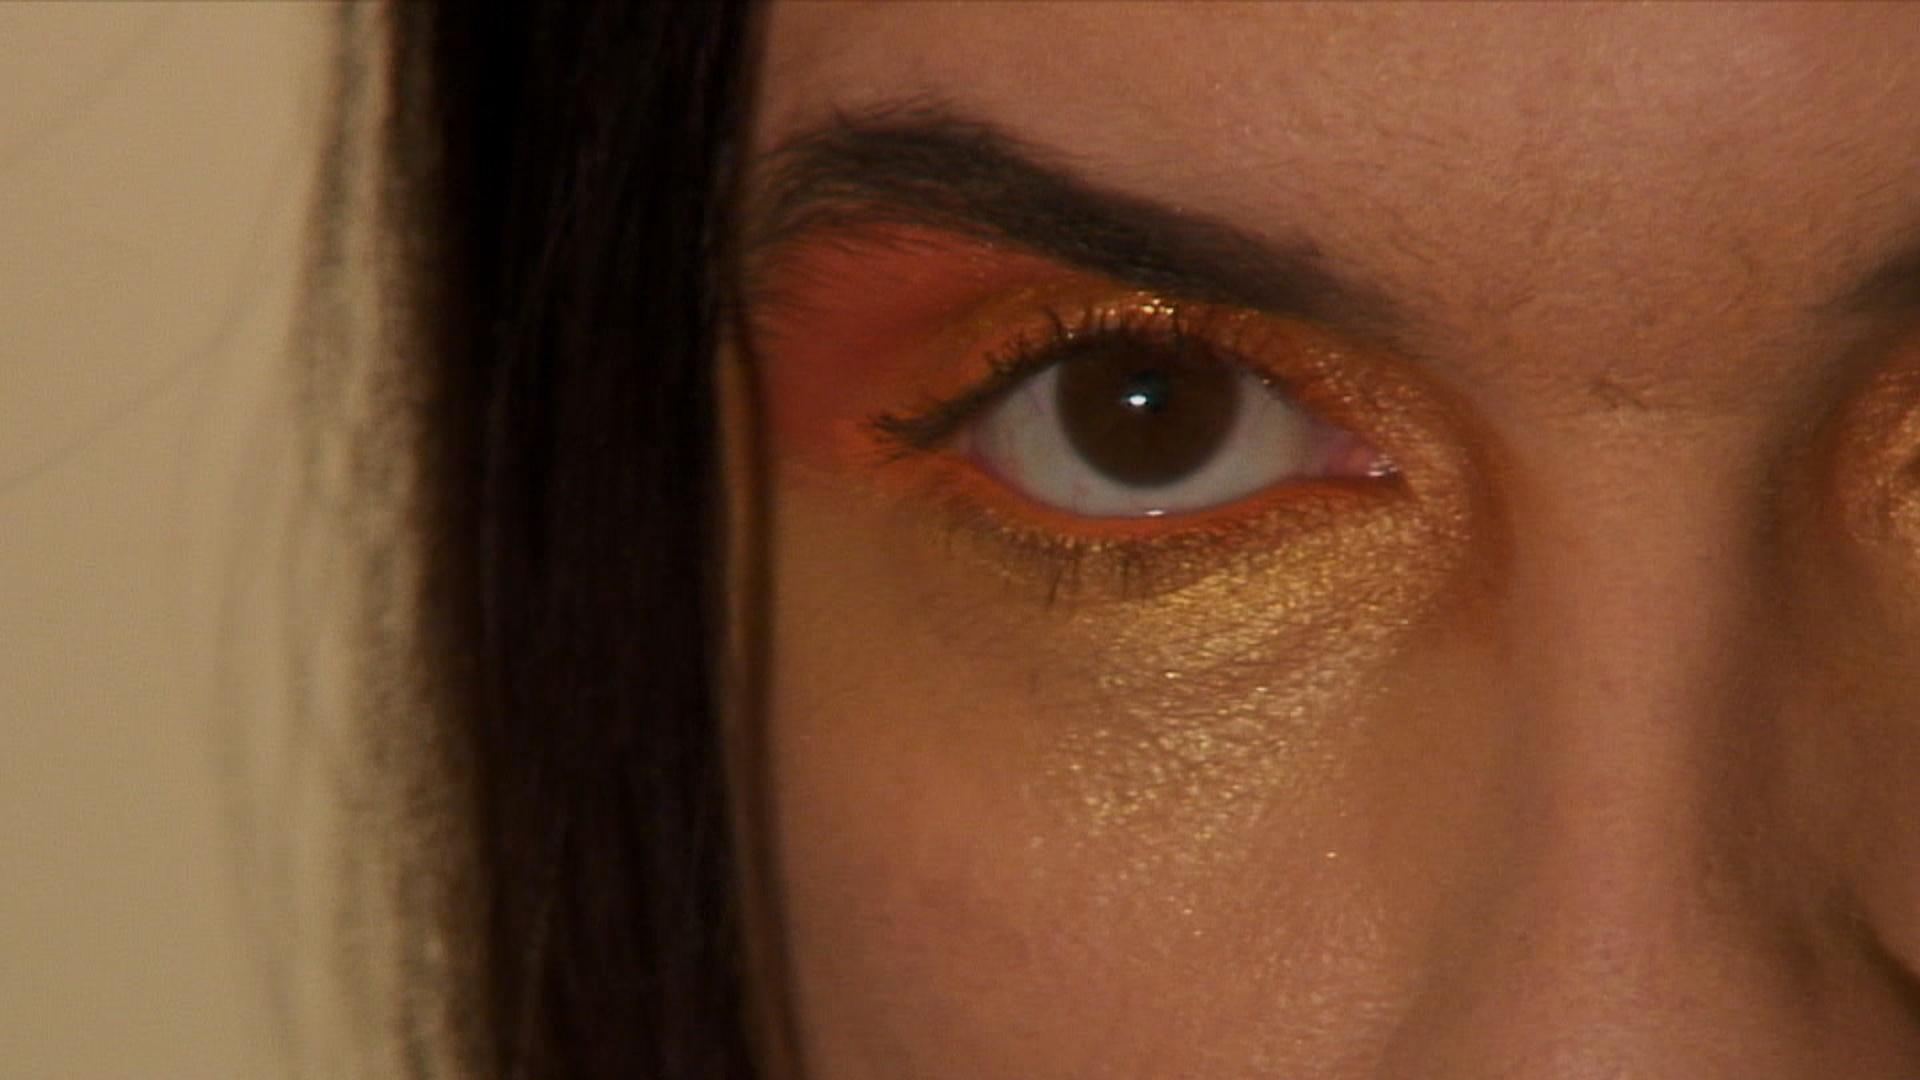 Rohan Quine, 'The Imagination Thief' - film 'JAYMI 115', still 44